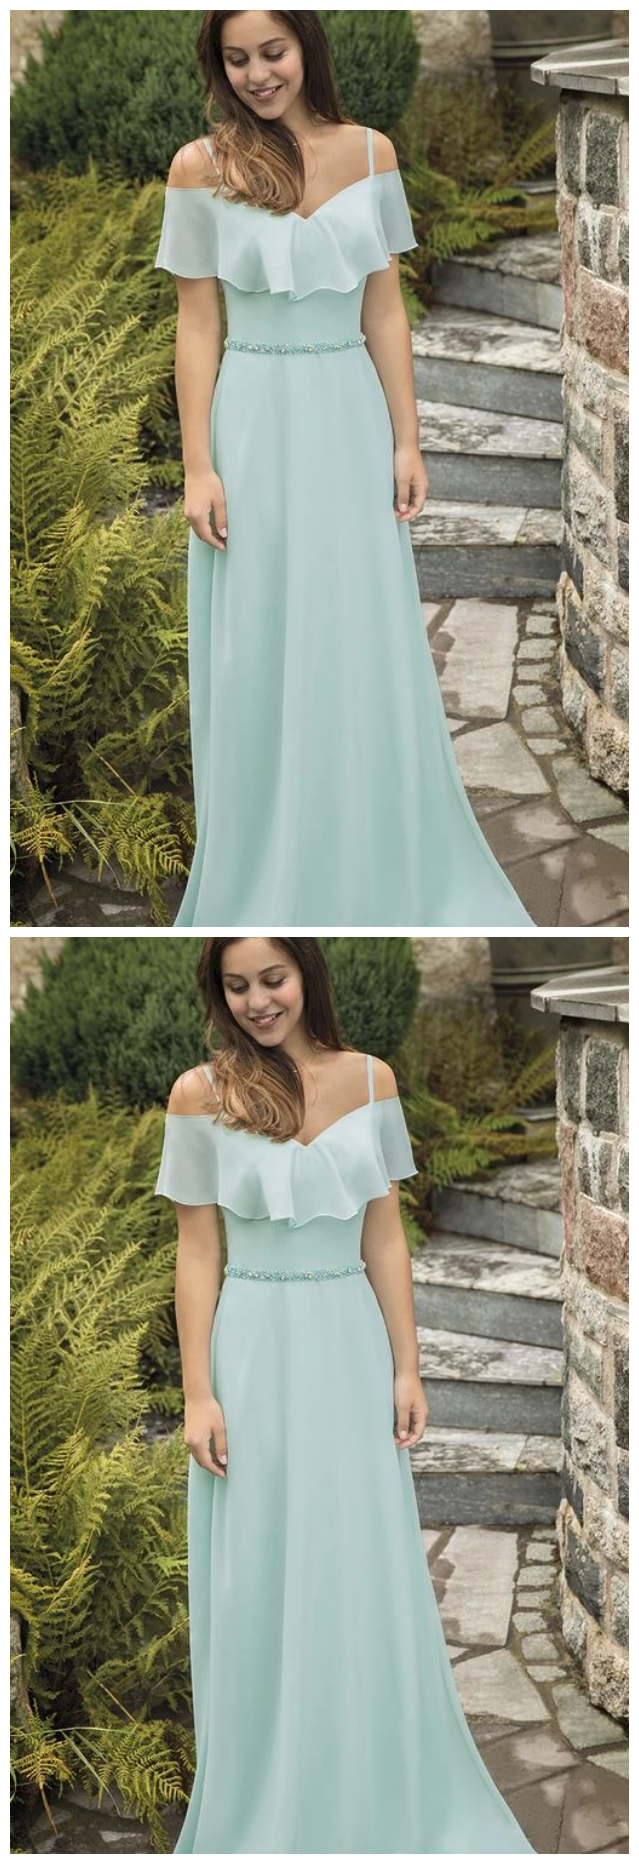 2019 light green long prom dress